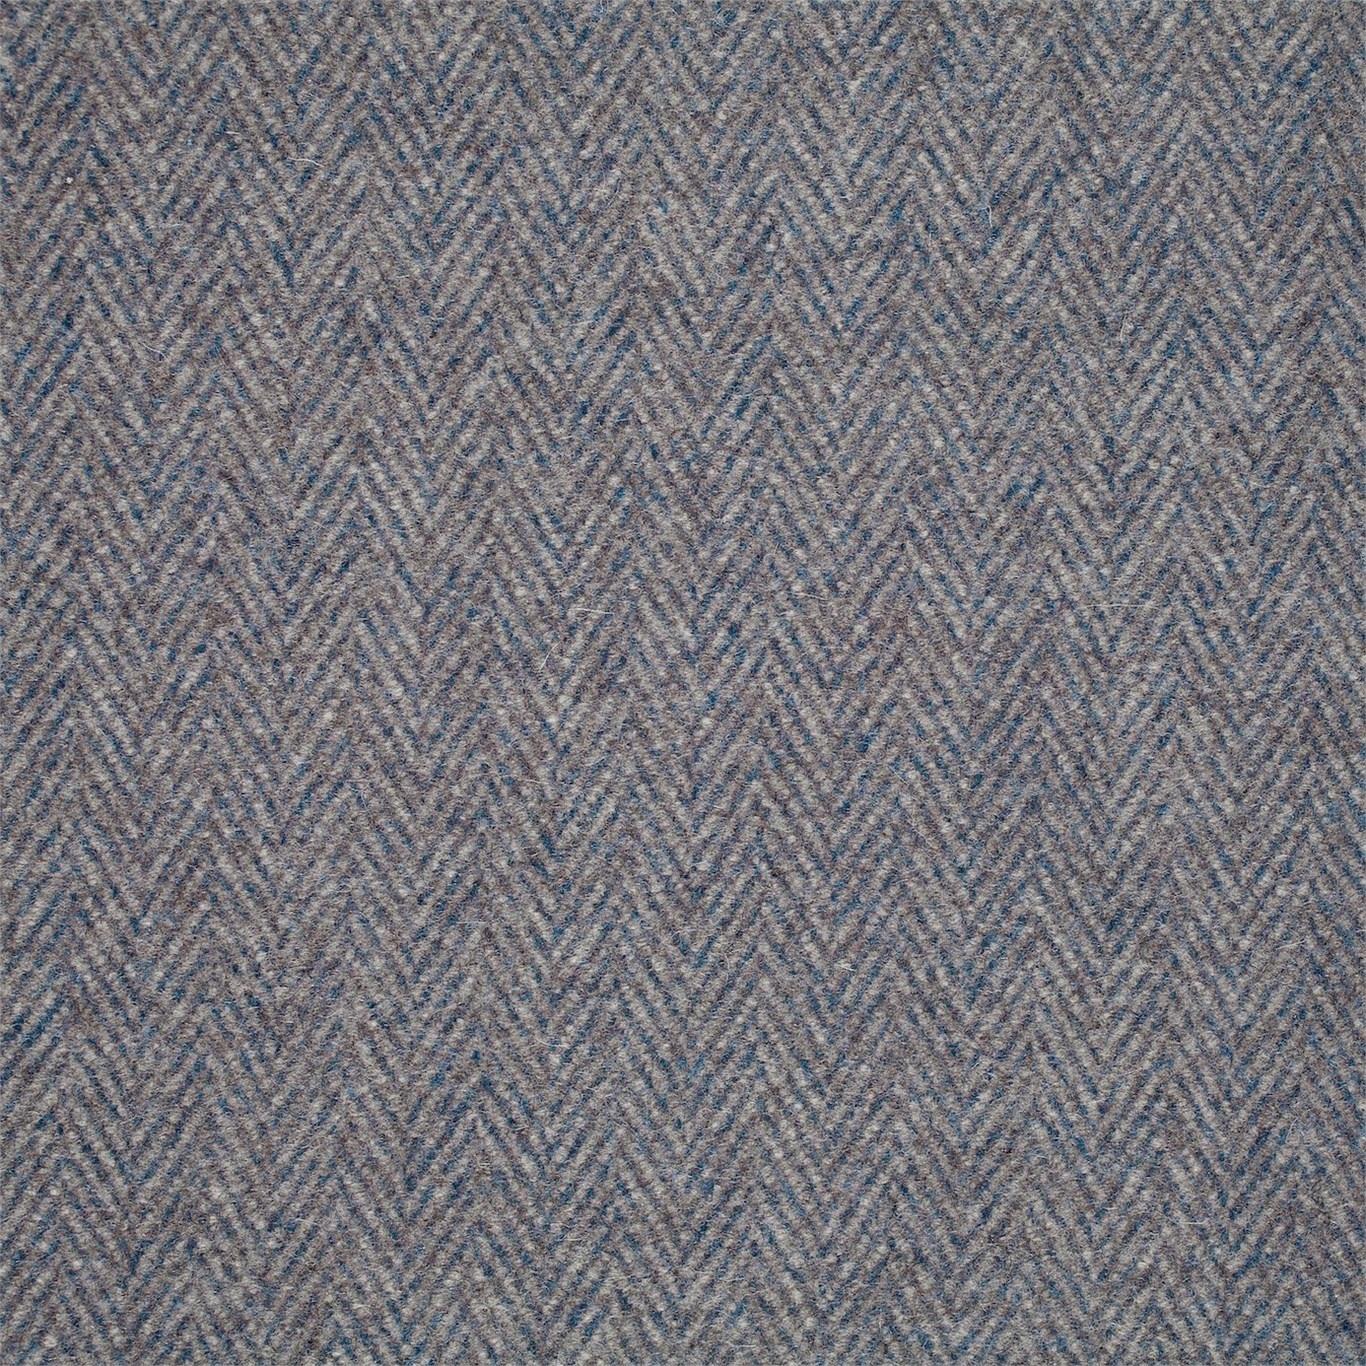 Image of Sanderson Portland Indigo Fabric 233233